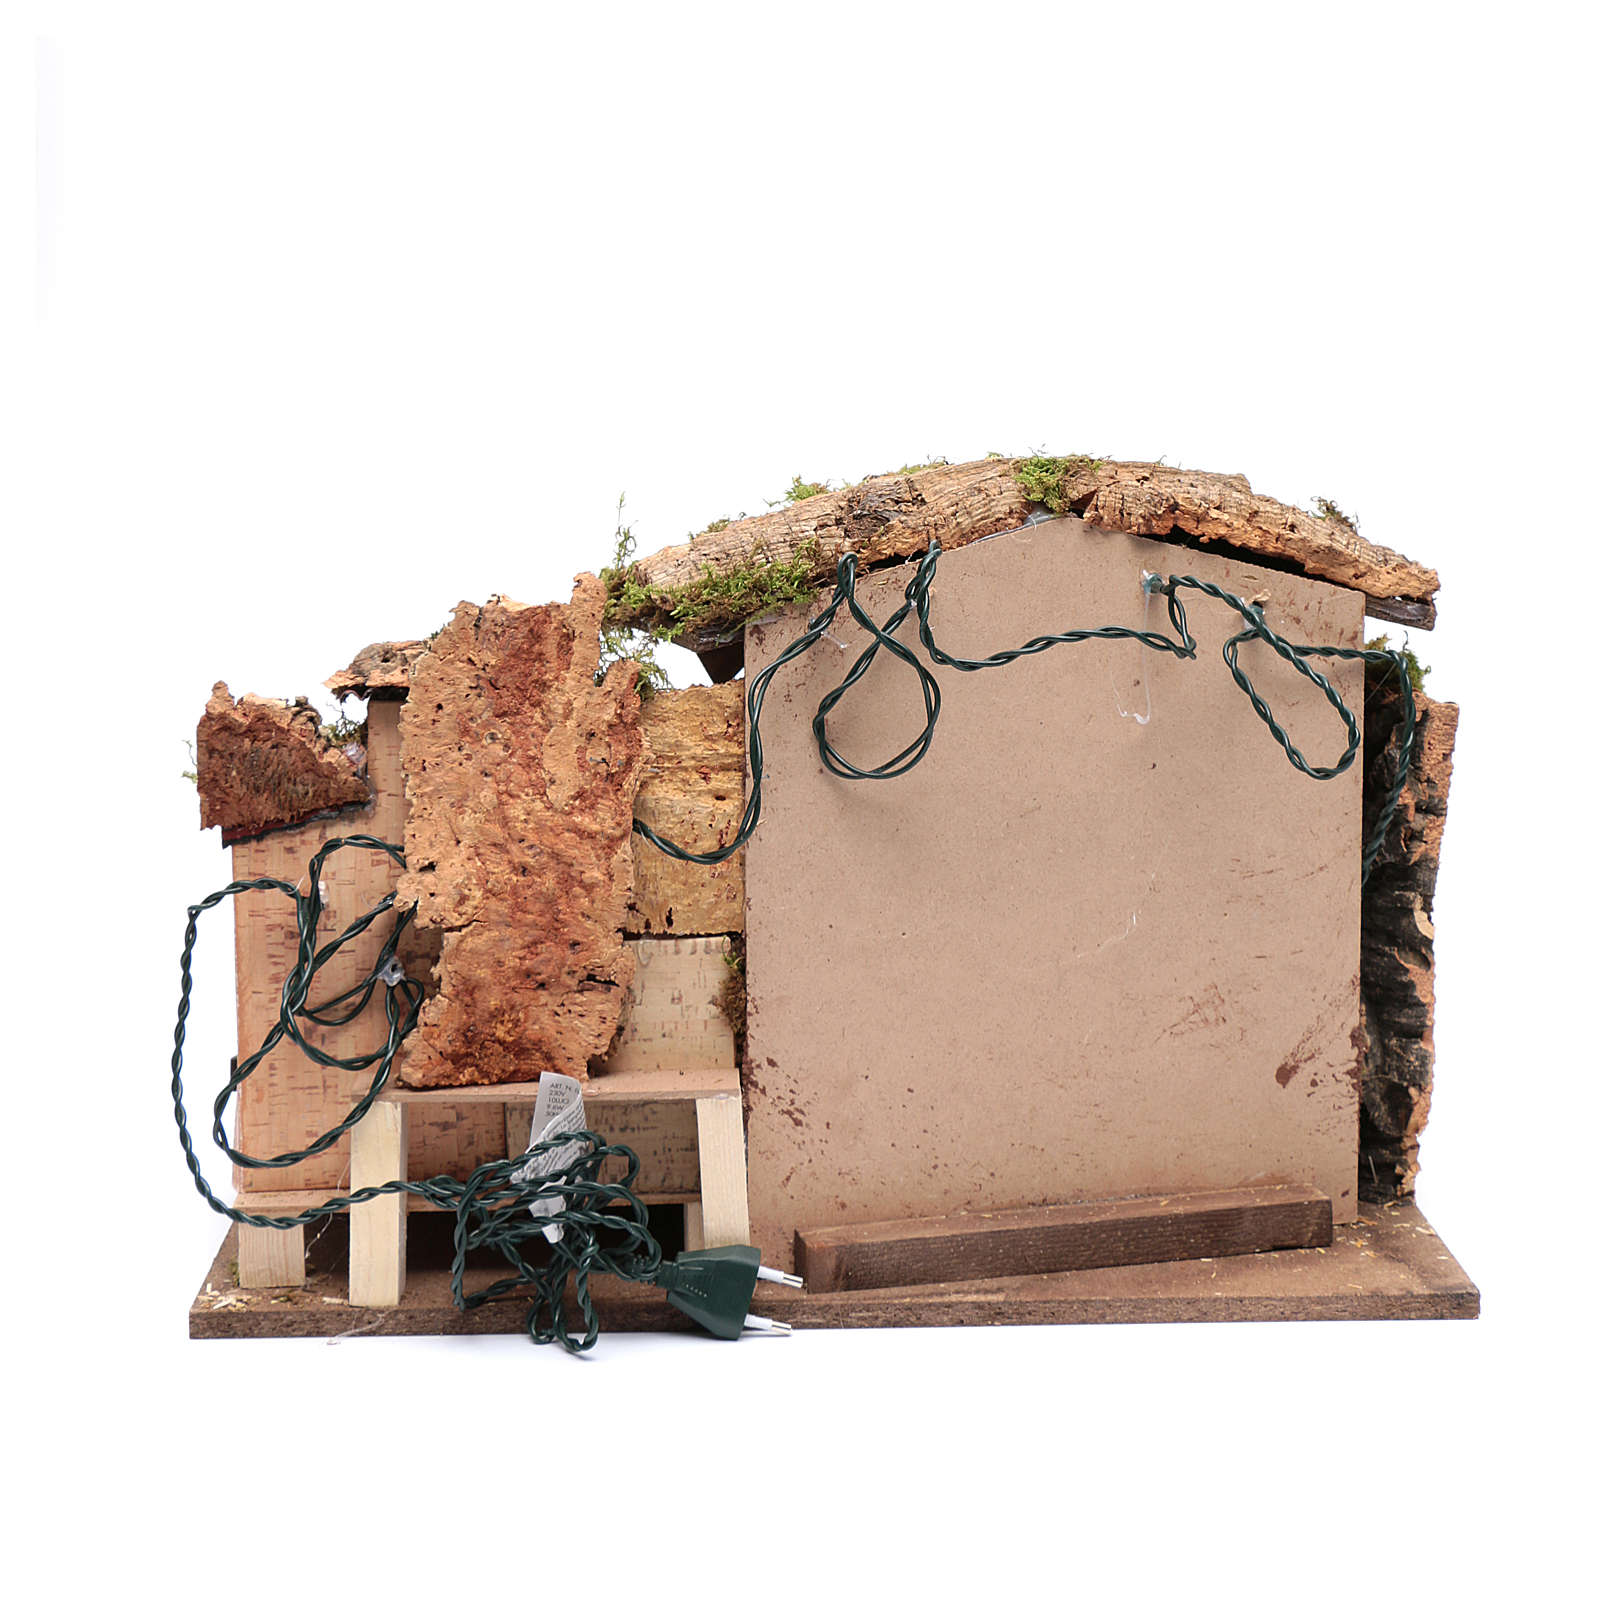 Ambientazione presepe 35x50x30 cm luci casetta e capanna 4